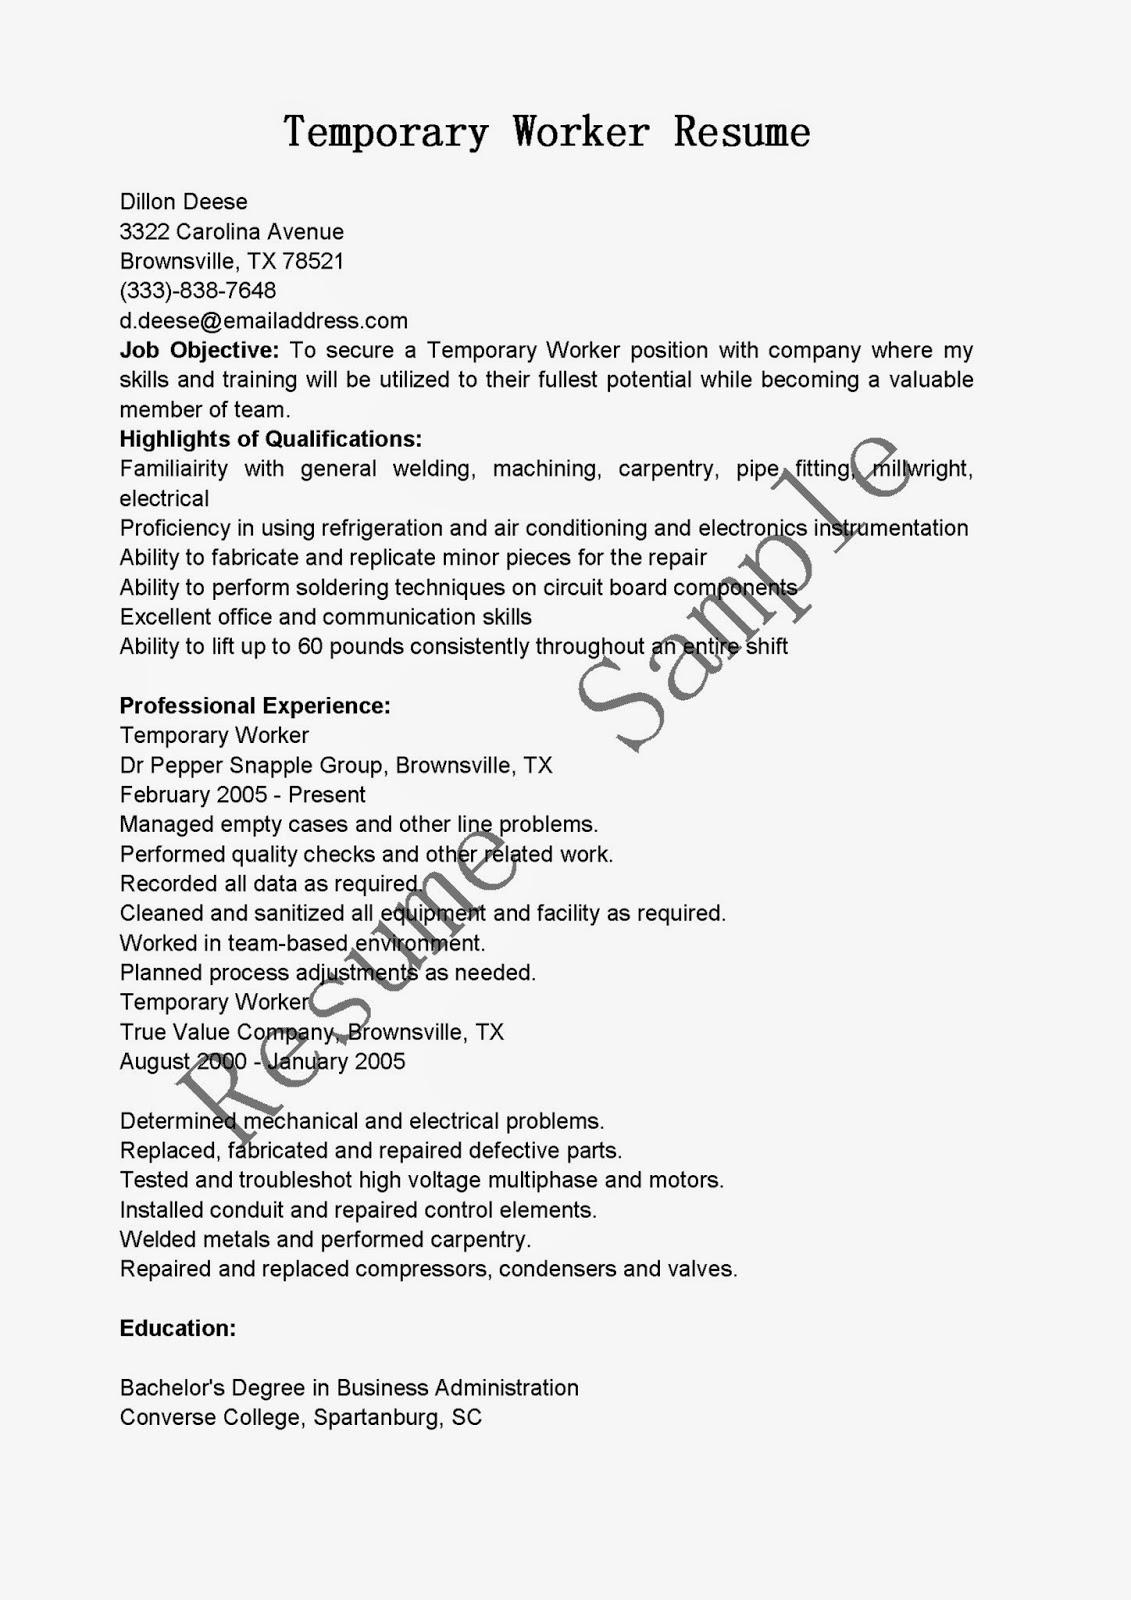 resume samples  temporary worker resume sample